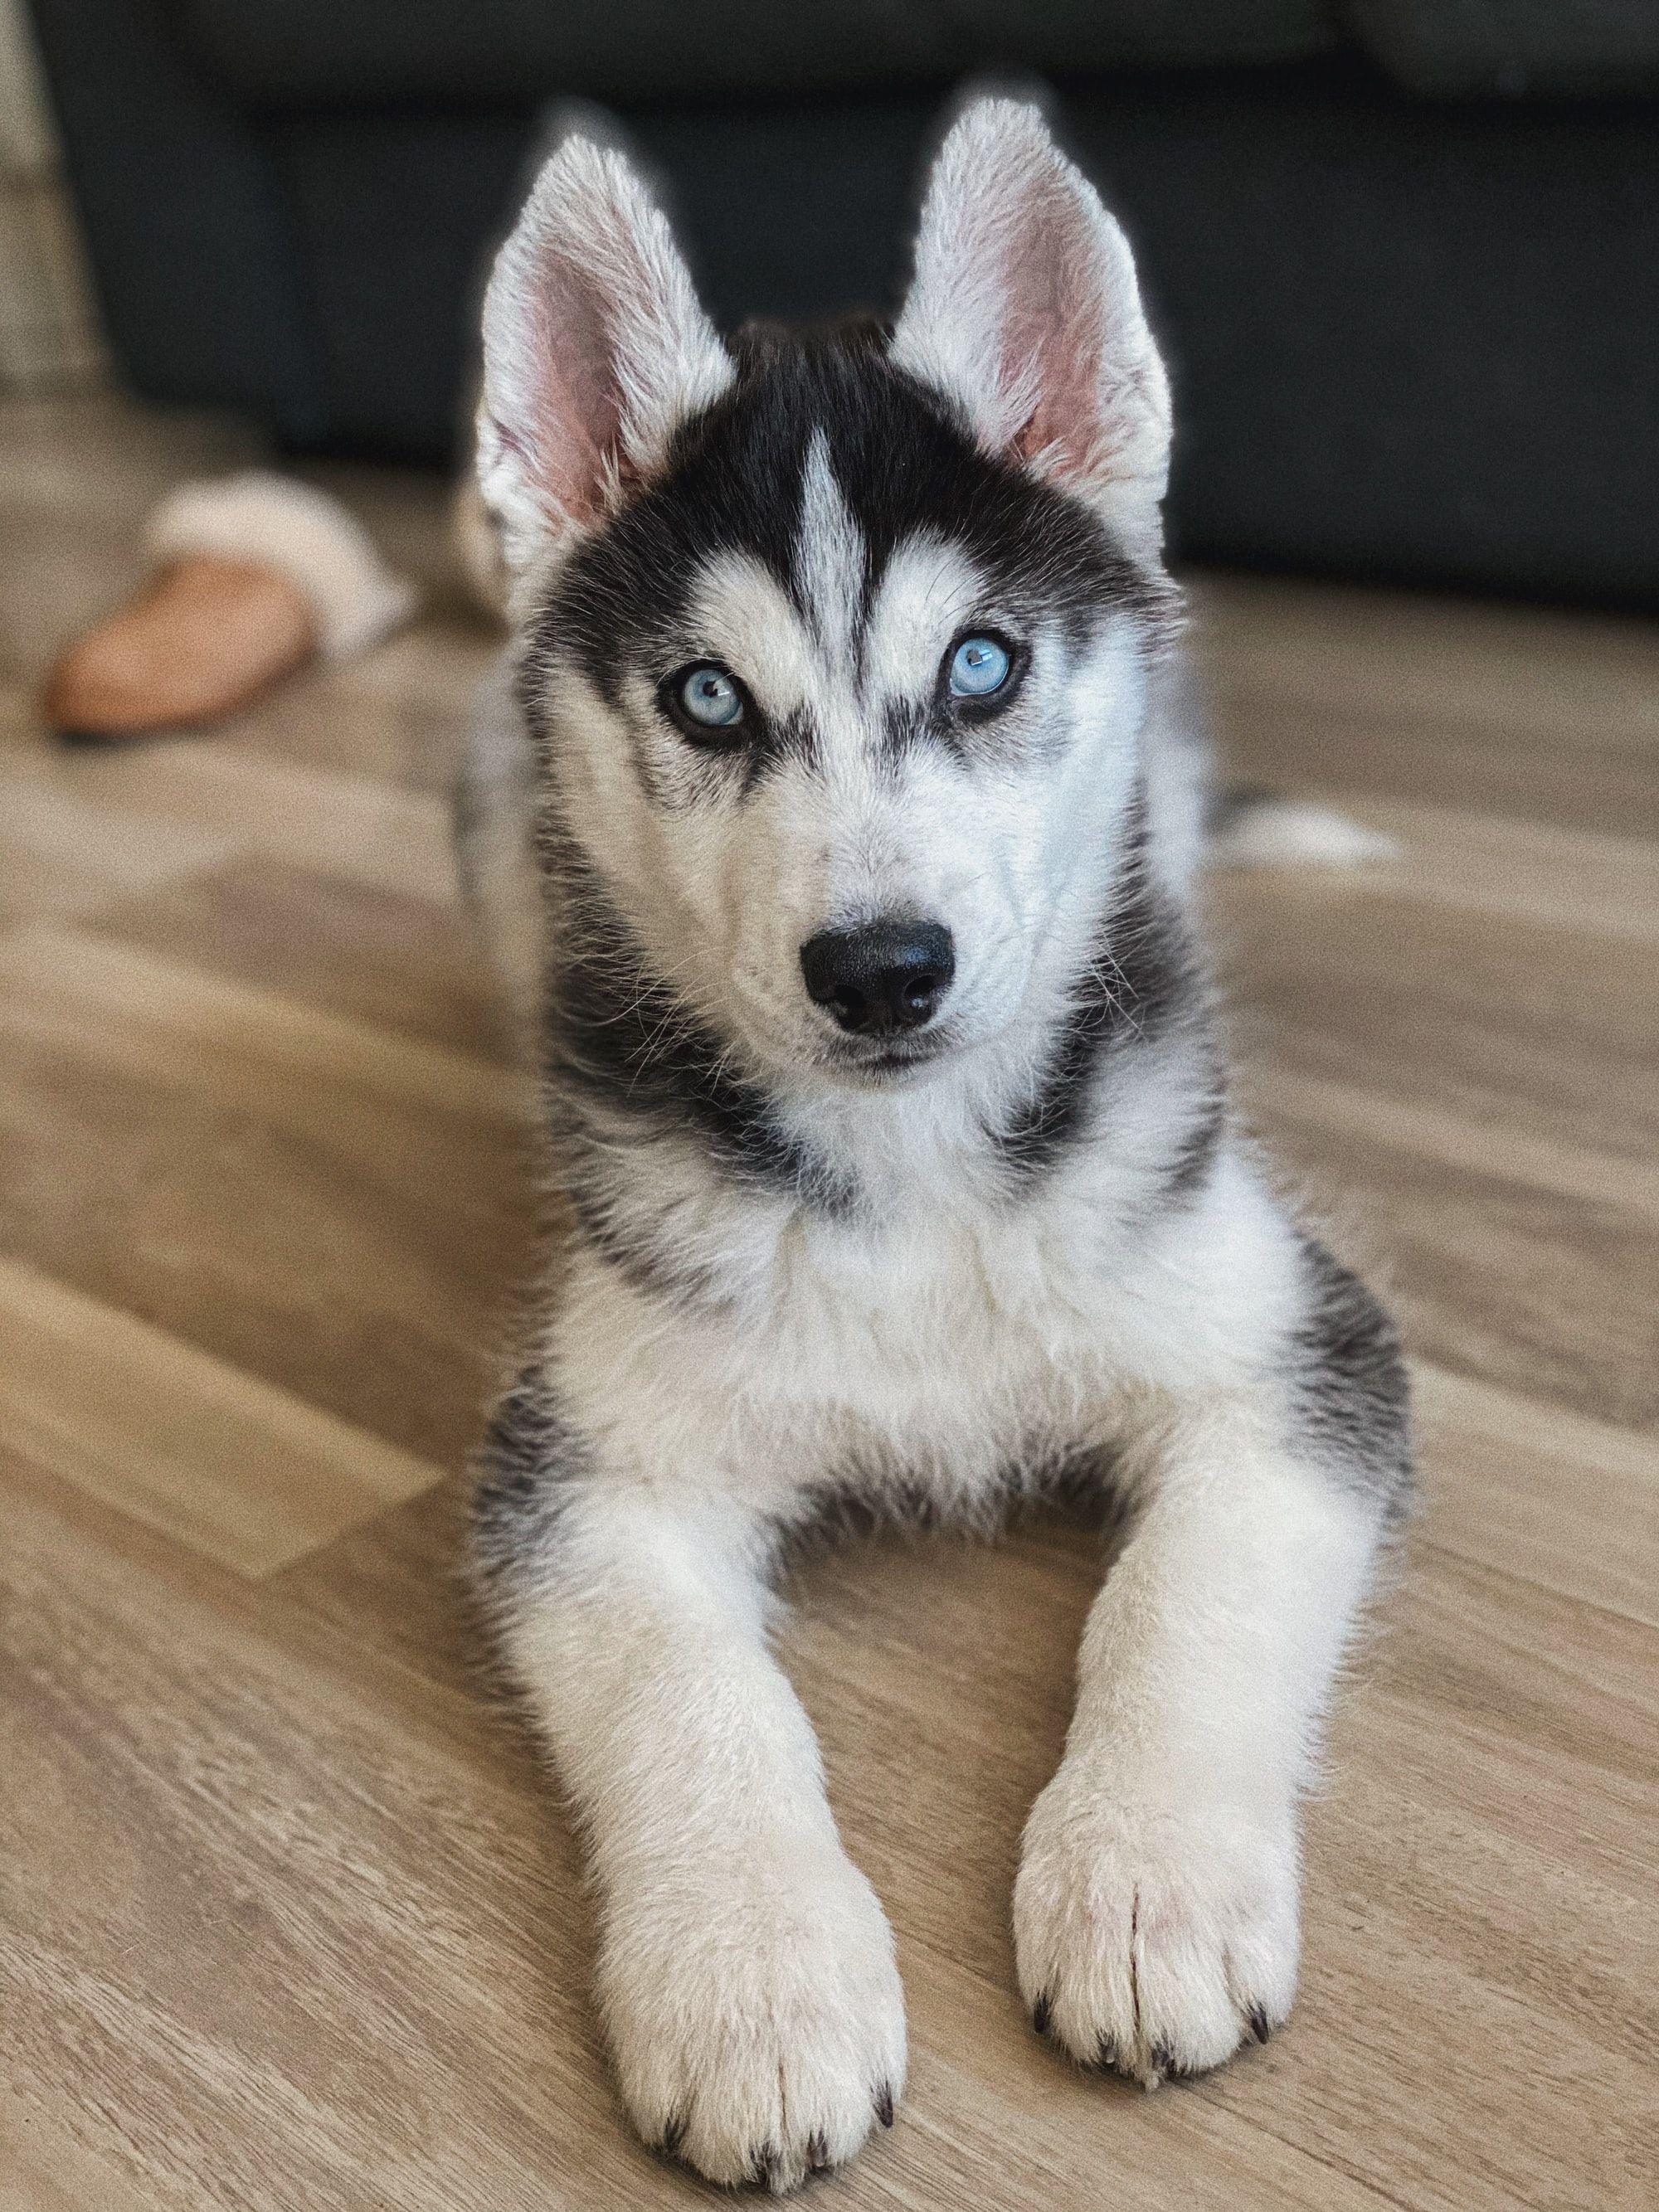 Why Do Huskies Talk?